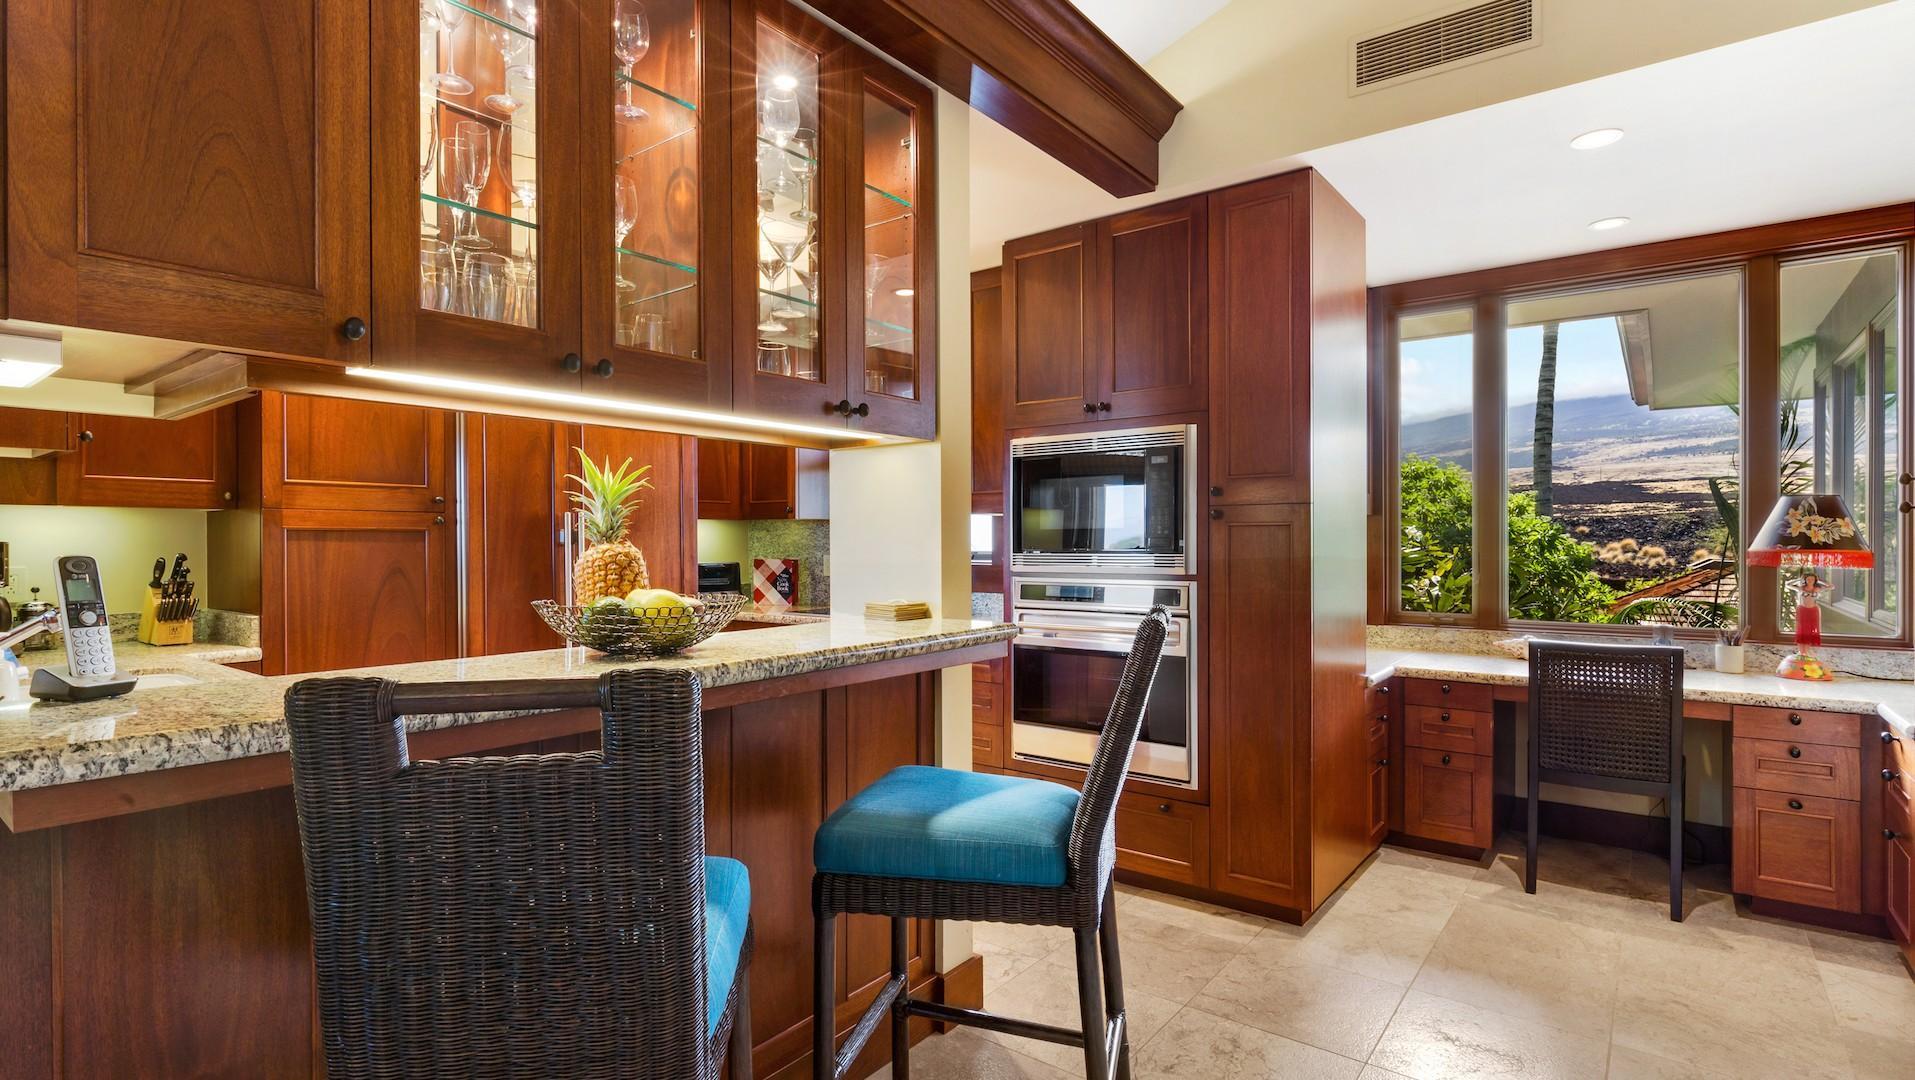 Kitchen bar and desk.